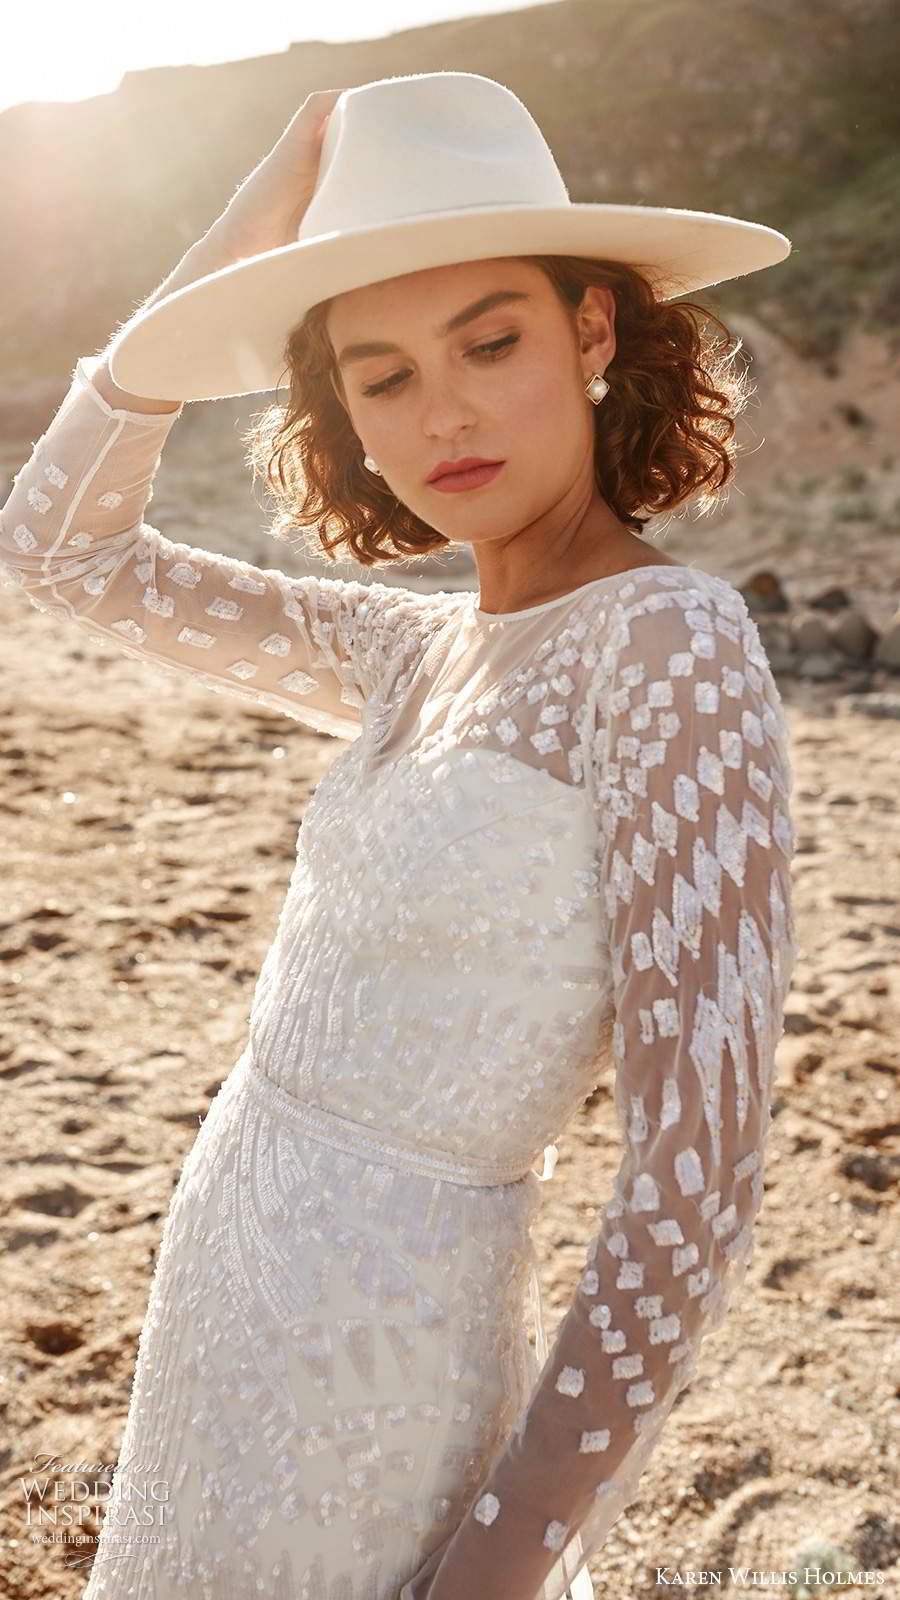 karen willis holmes 2020 bridal illusion long sleeves jewel neckline fully embellished sheath wedding dress keyhole back chapel train (1) zv